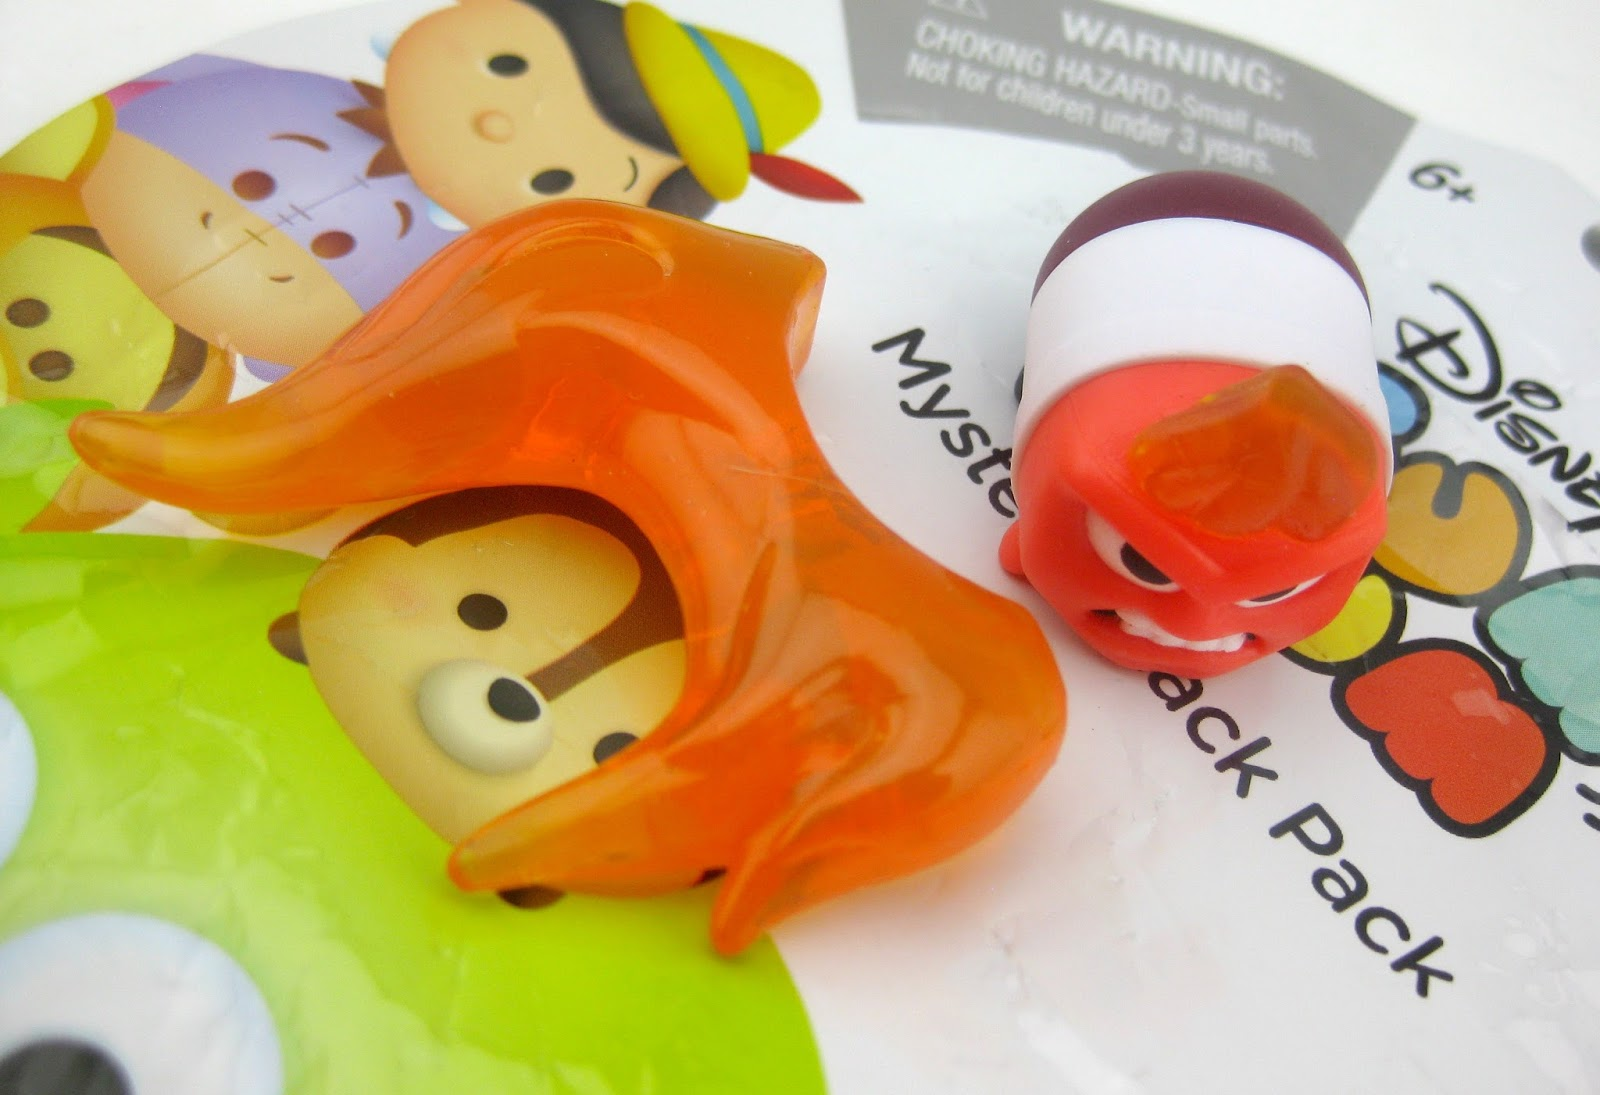 Disney Tsum Tsum Mystery Stack Packs by Jakks Pacific (Series 2) anger